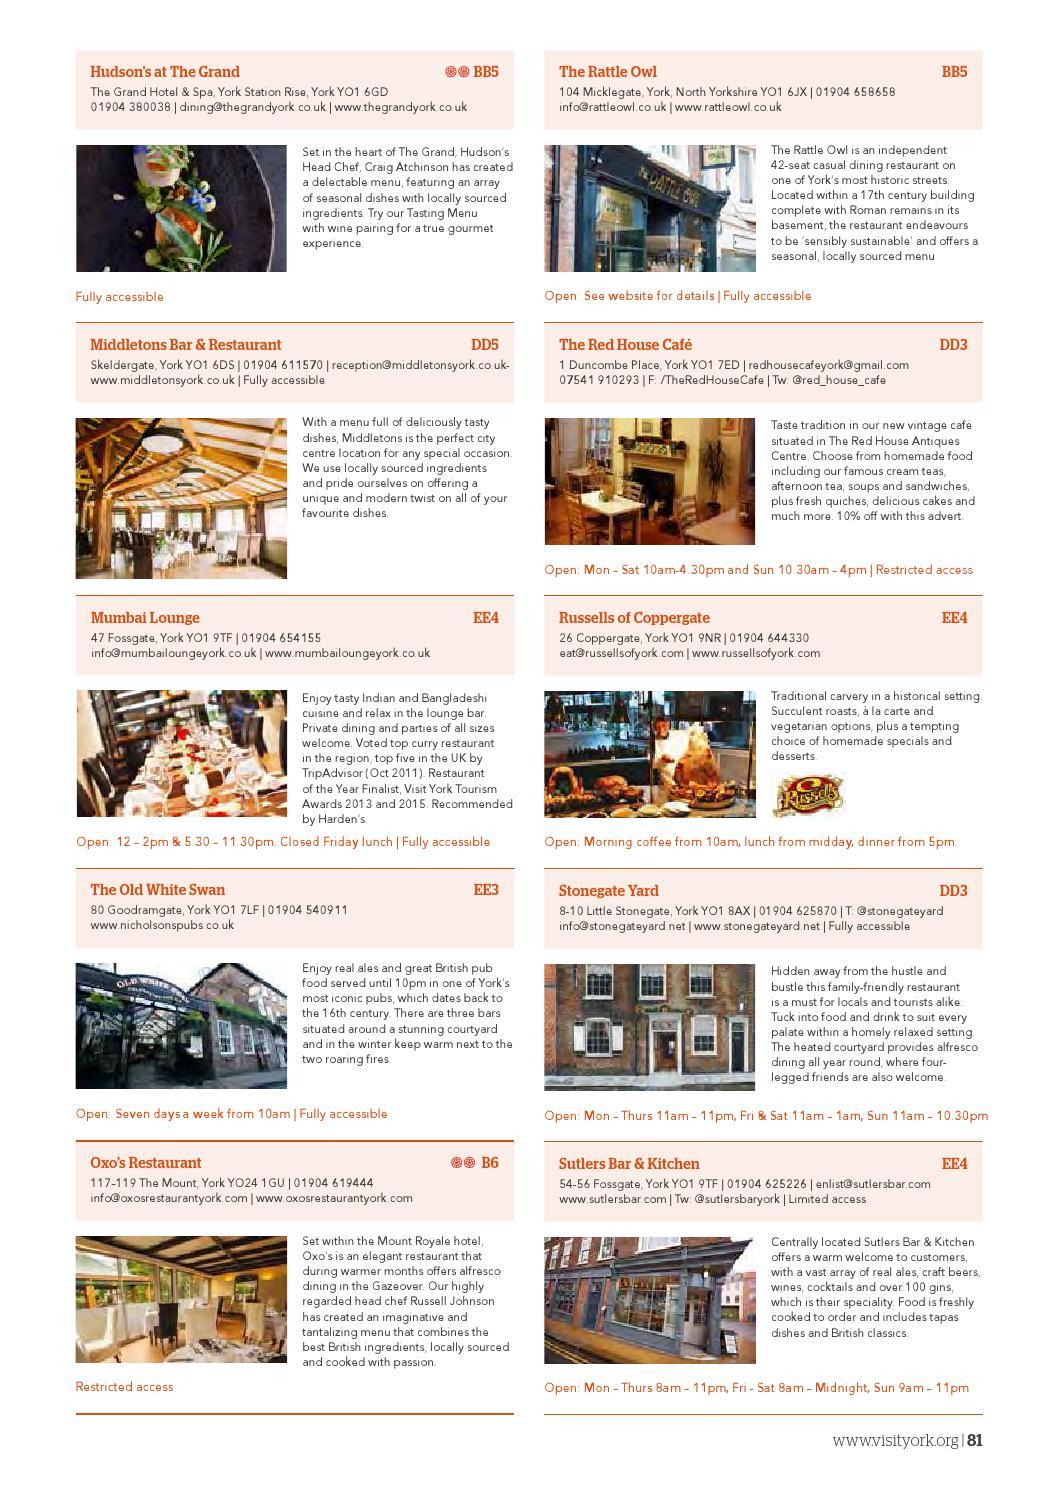 York Destination Guide 2016 by Visit York - issuu